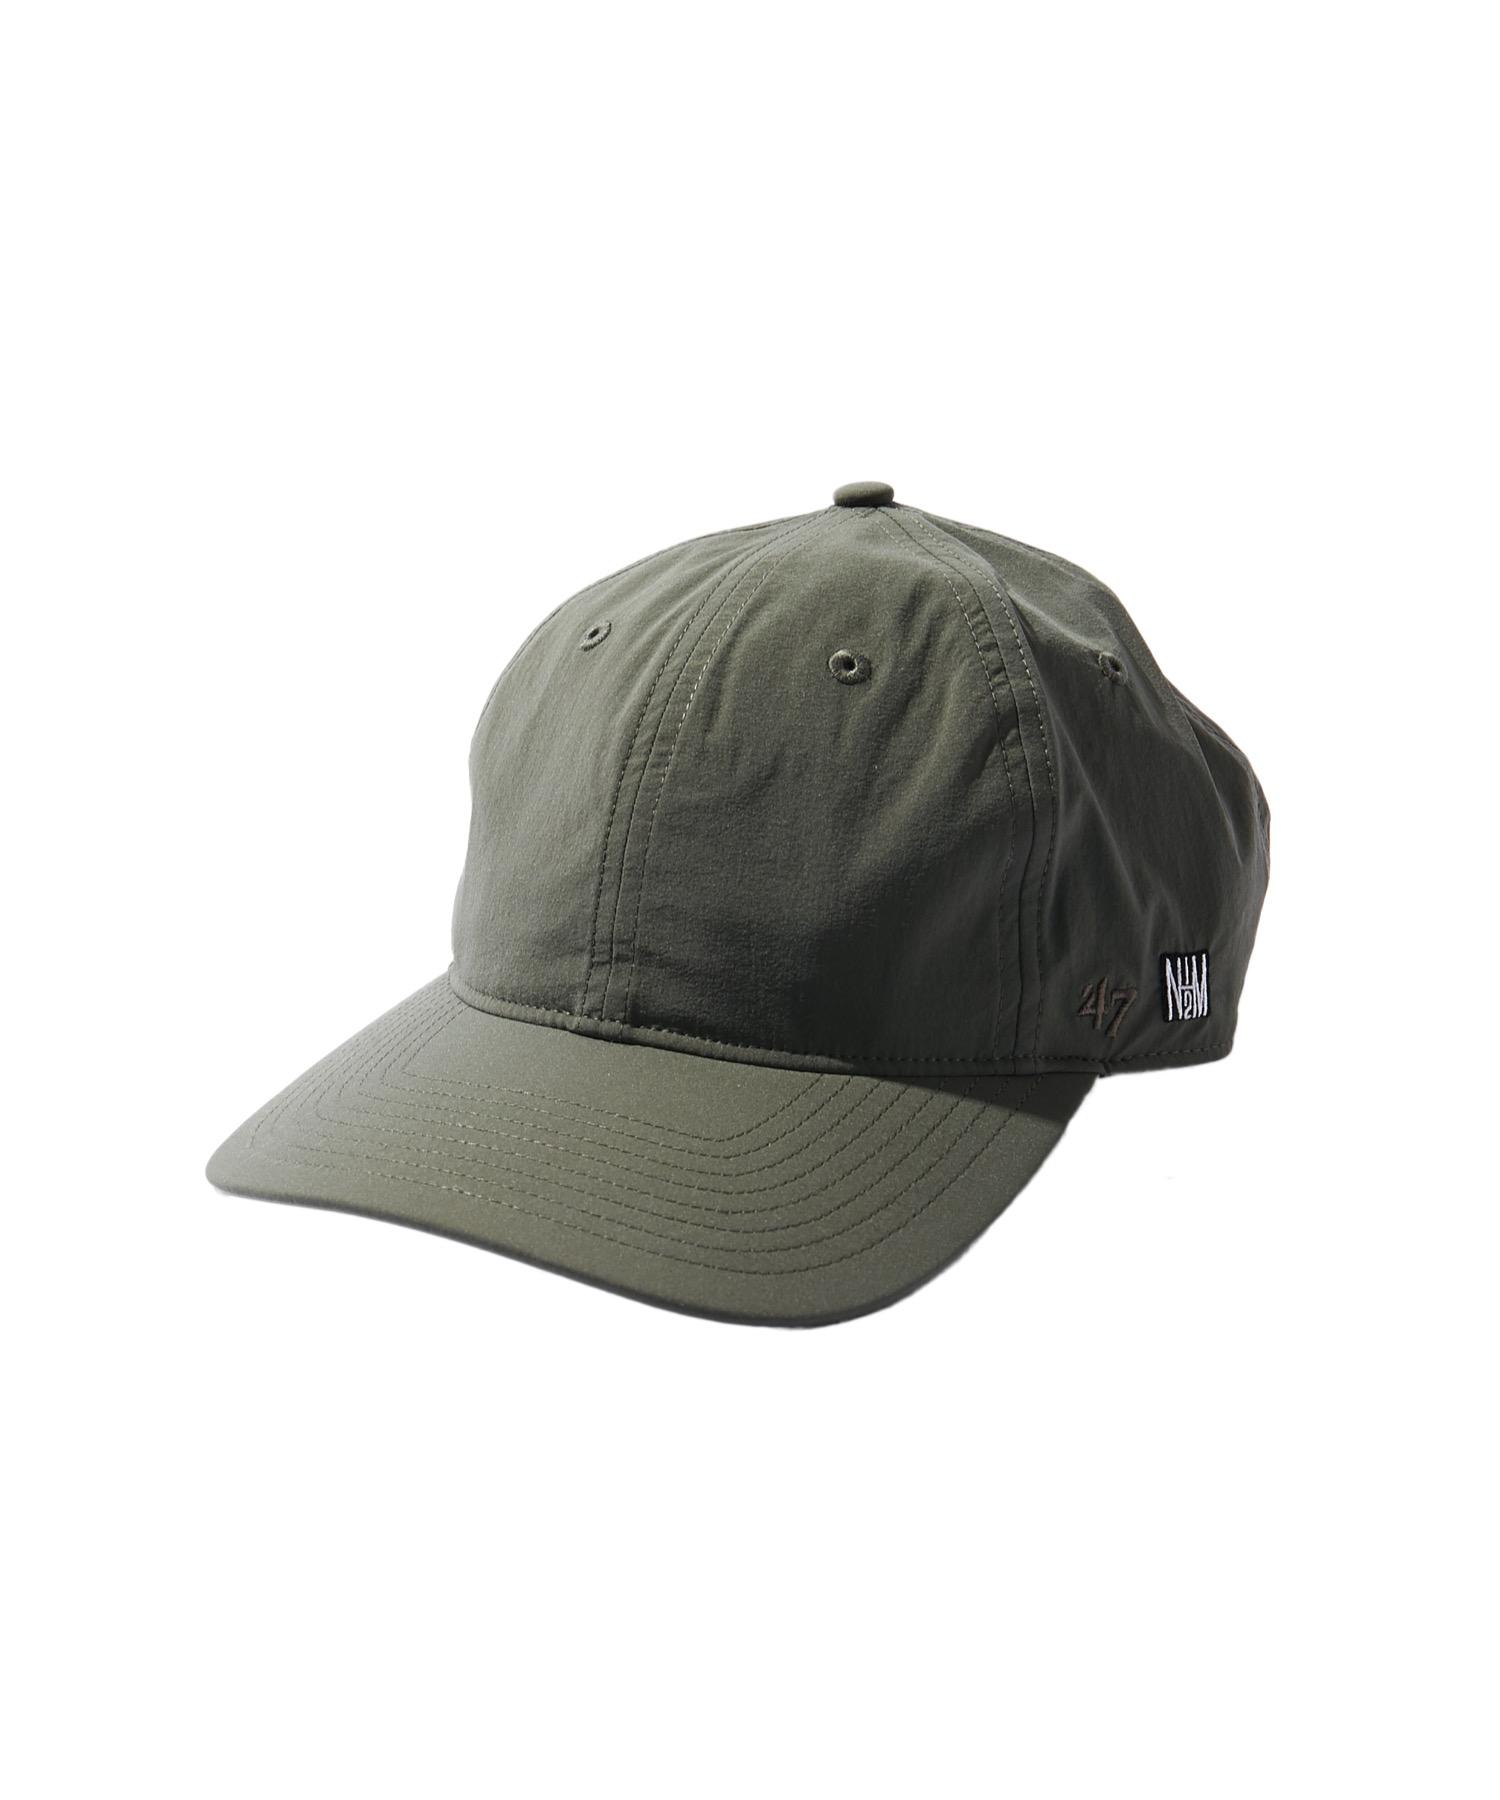 SPRING2020 CAP【N.HOOLYWOOD COMPILE × '47】